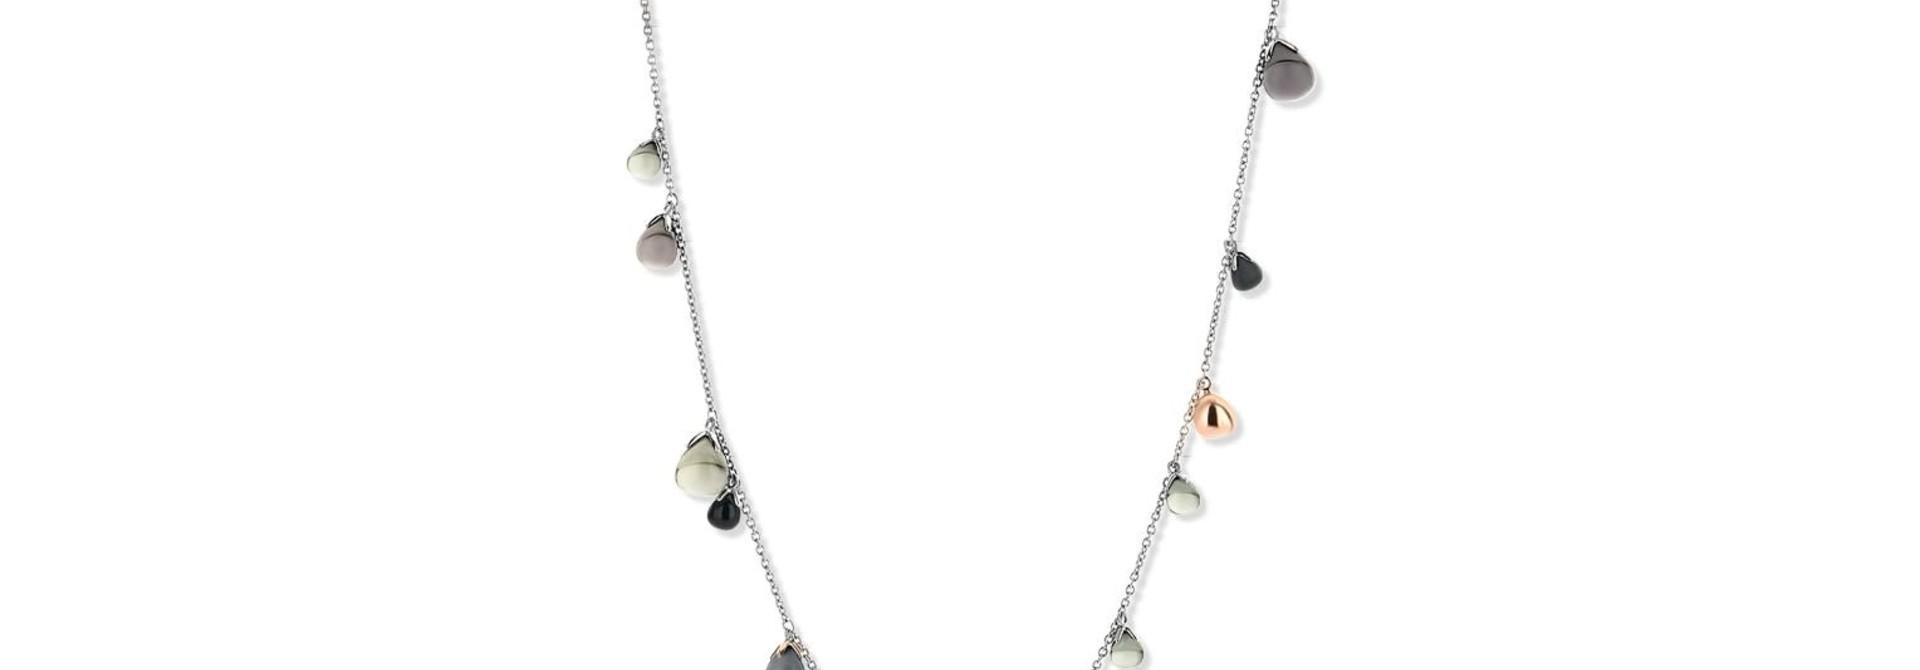 TI SENTO - Milano Necklace 3929BG